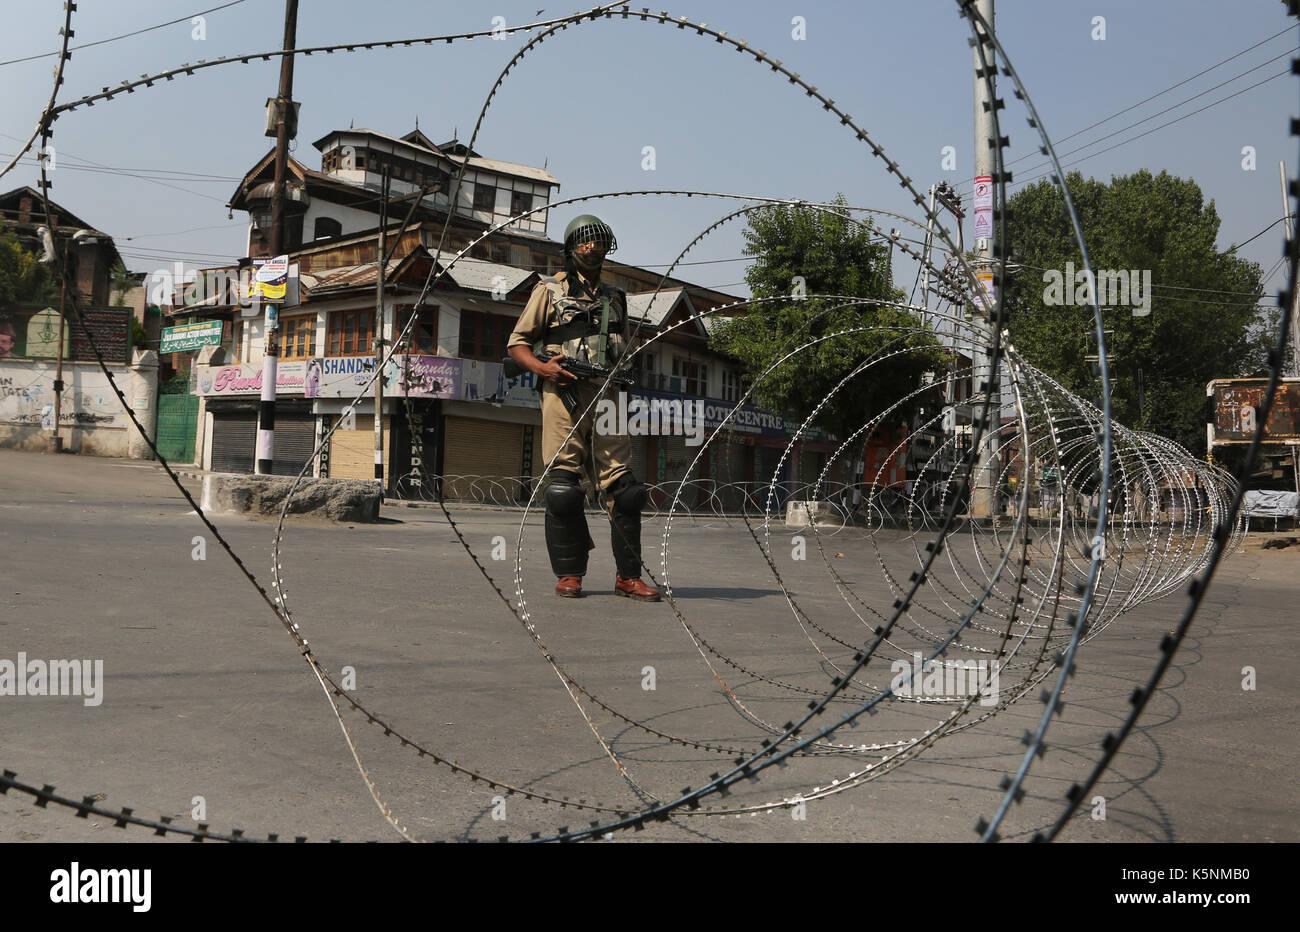 Srinagar, Indian-controlled Kashmir. 10th Sep, 2017. An Indian paramilitary trooper stands guard near a barricade - Stock Image